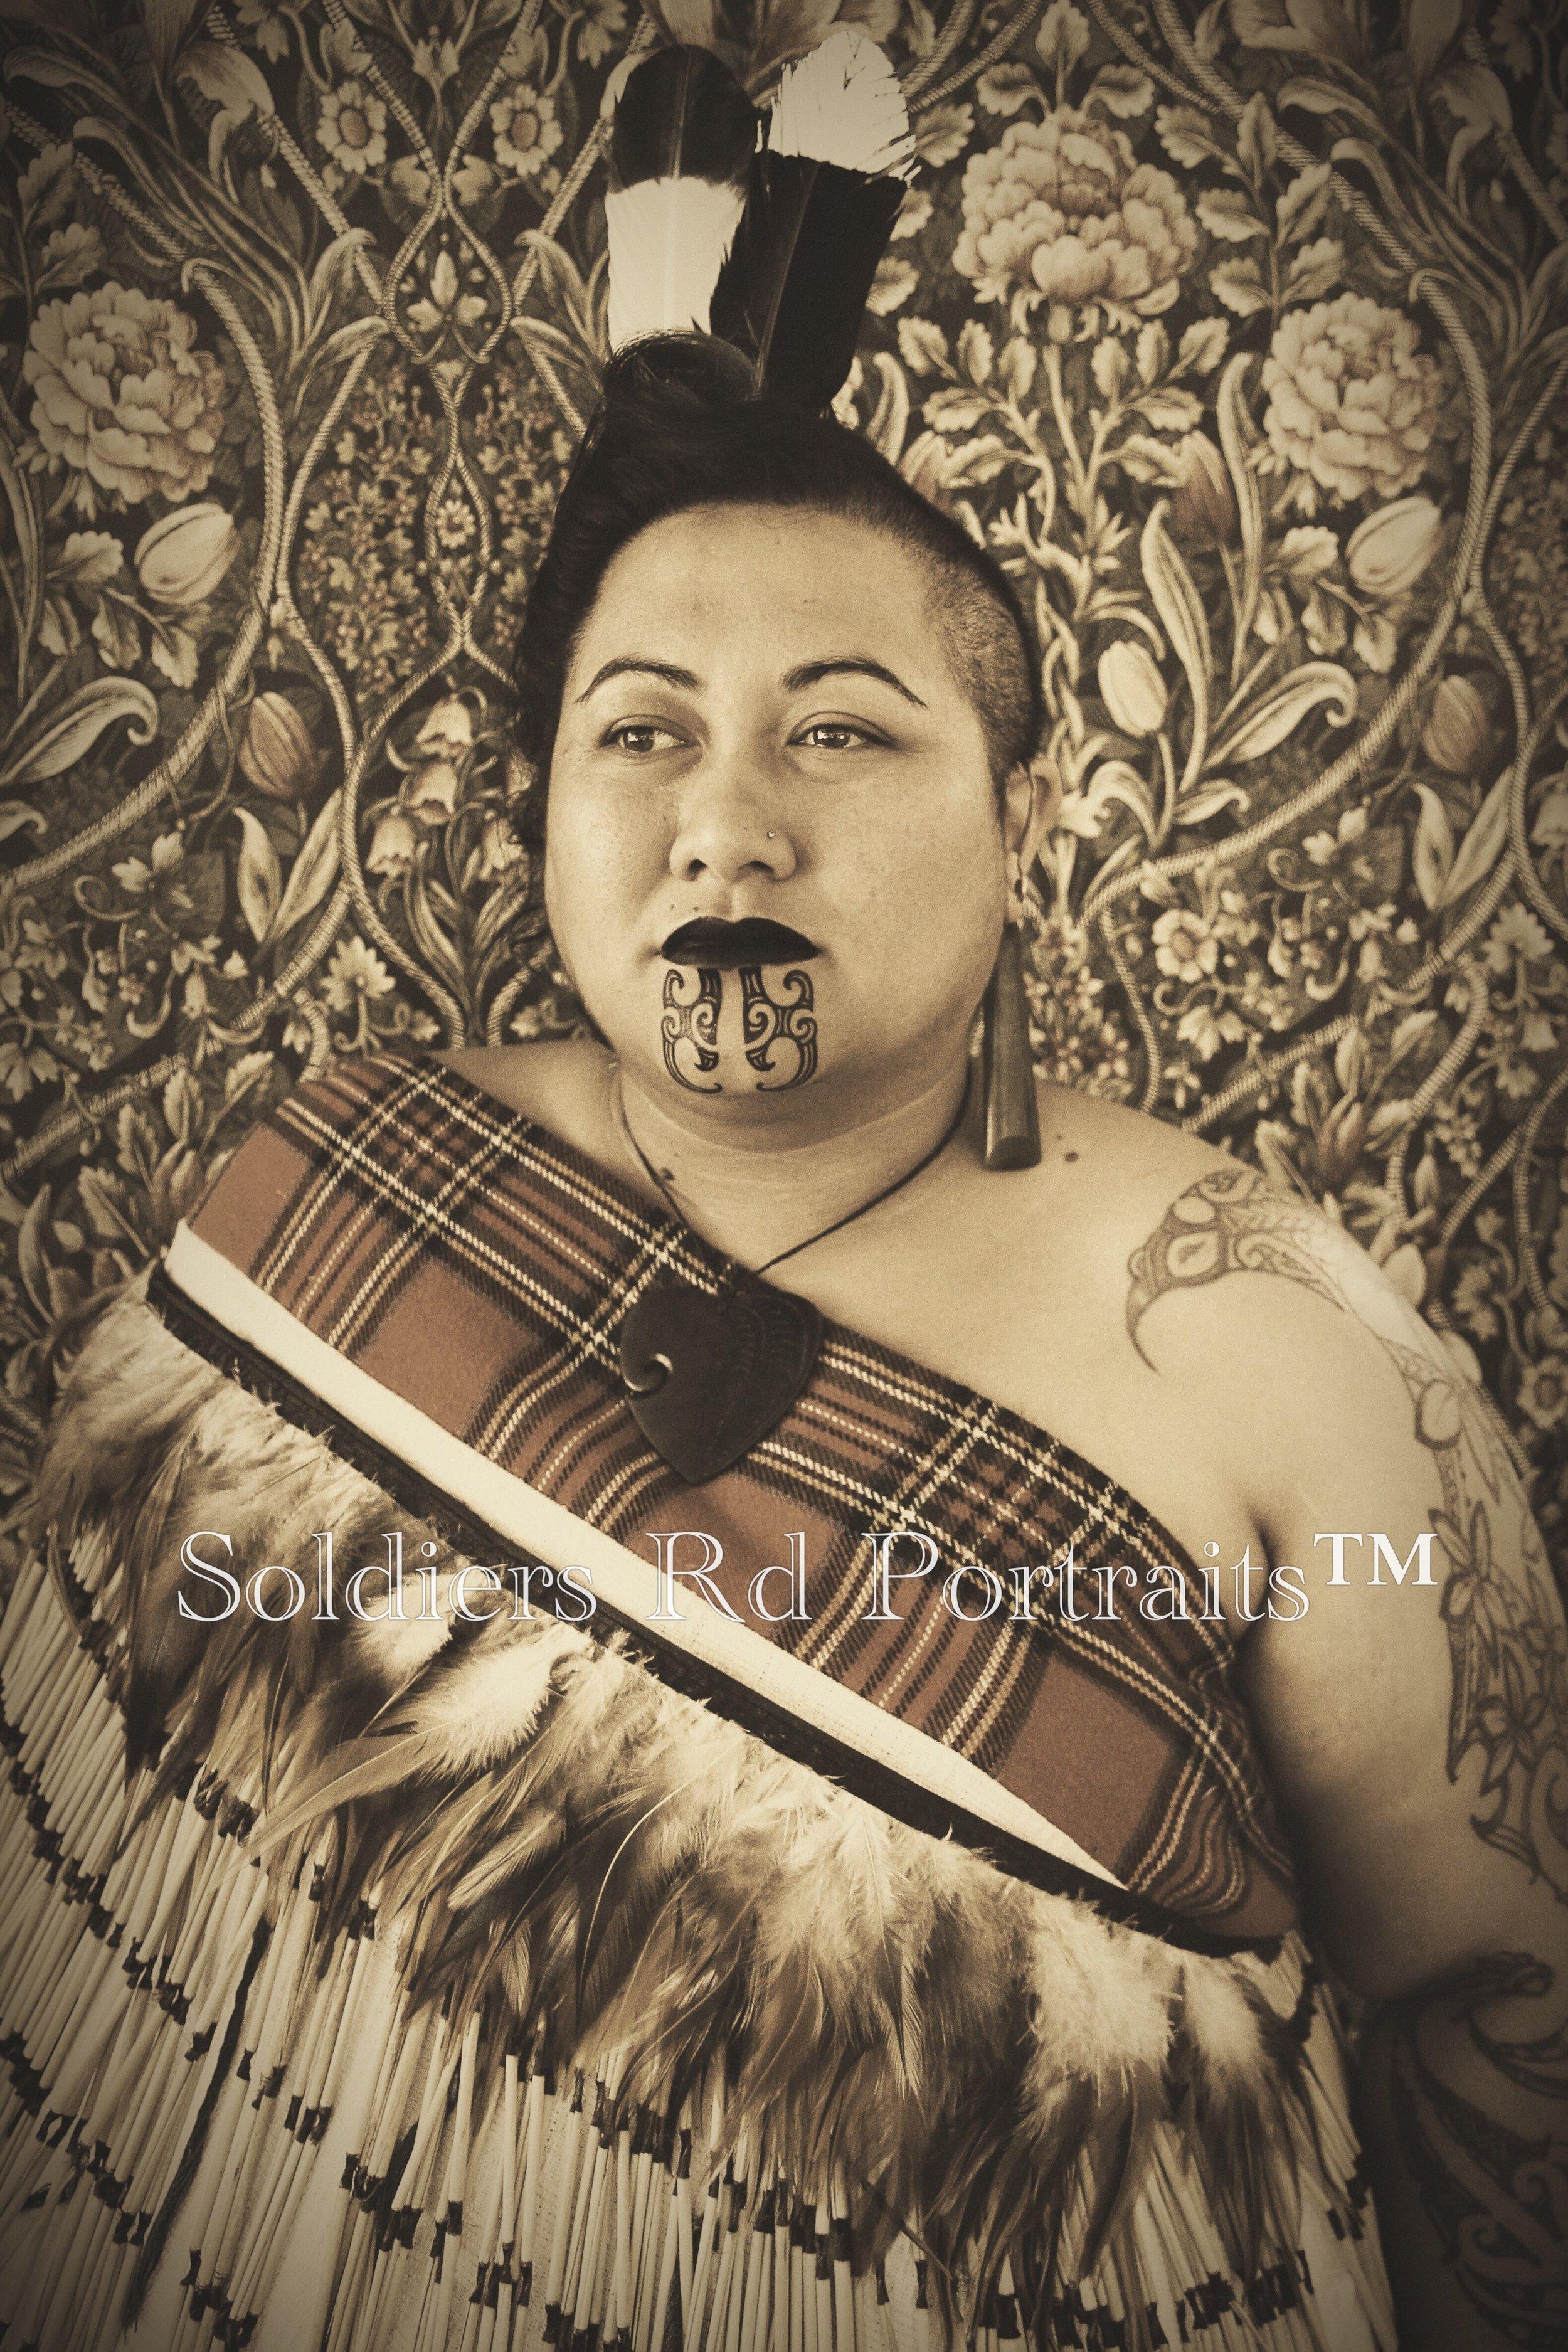 Alicia Tuau - SOCIAL SUPPORT WORKER WHARE 4 WHĀNAUKo tenei toku pepeha I te taha o toku mamaKo Taupiri toku MaungaKo Waikato toku AwaKo Tainui toku WakaKo Waikato toku IwiKo Ngati-Pou, ko Ngati-Hine ōku HapuKo Horahora toku MaraeNo Tauranga Moana taku Kainga inaianeiKo Alicia Tuau toku IngoaI am a Maori wahine toa, currently completing my social work degree at University of Waikato and have been working for Te Tuinga Whānau / Whare 4 Whānau for 1 year since my 3rd year placement here in 2017.My view of myself has strengthened in many aspects of my life and I now have qualities that I can offer people. Things, such as the restoration of Mana (control, power and influence) and Manākitanga (hospitality, kindness, generosity, support).